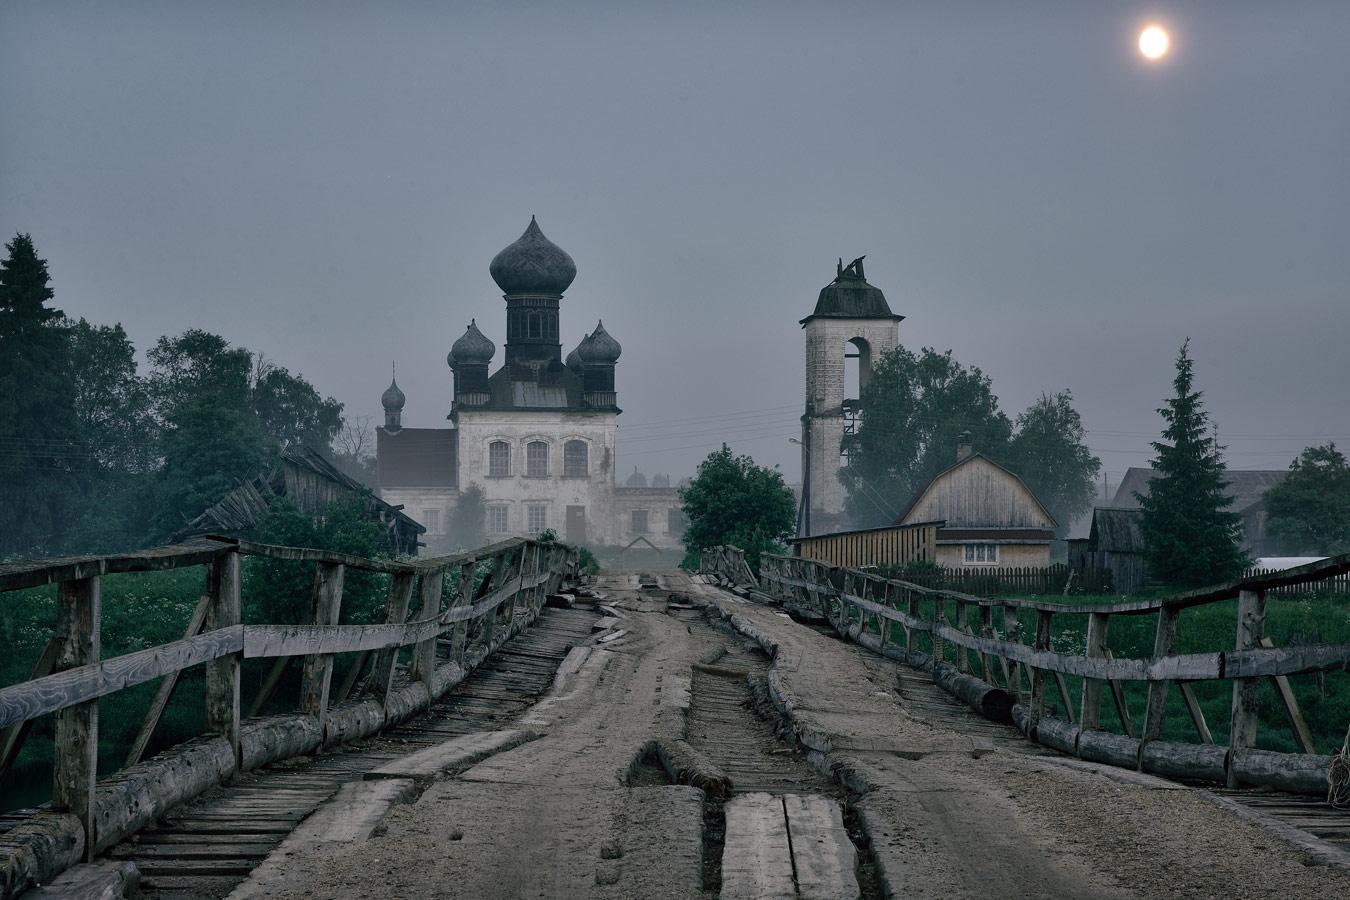 © Михаил Прохоров, 8-е место, Фотоконкурс «Вики любит памятники» — Wiki Loves Monuments